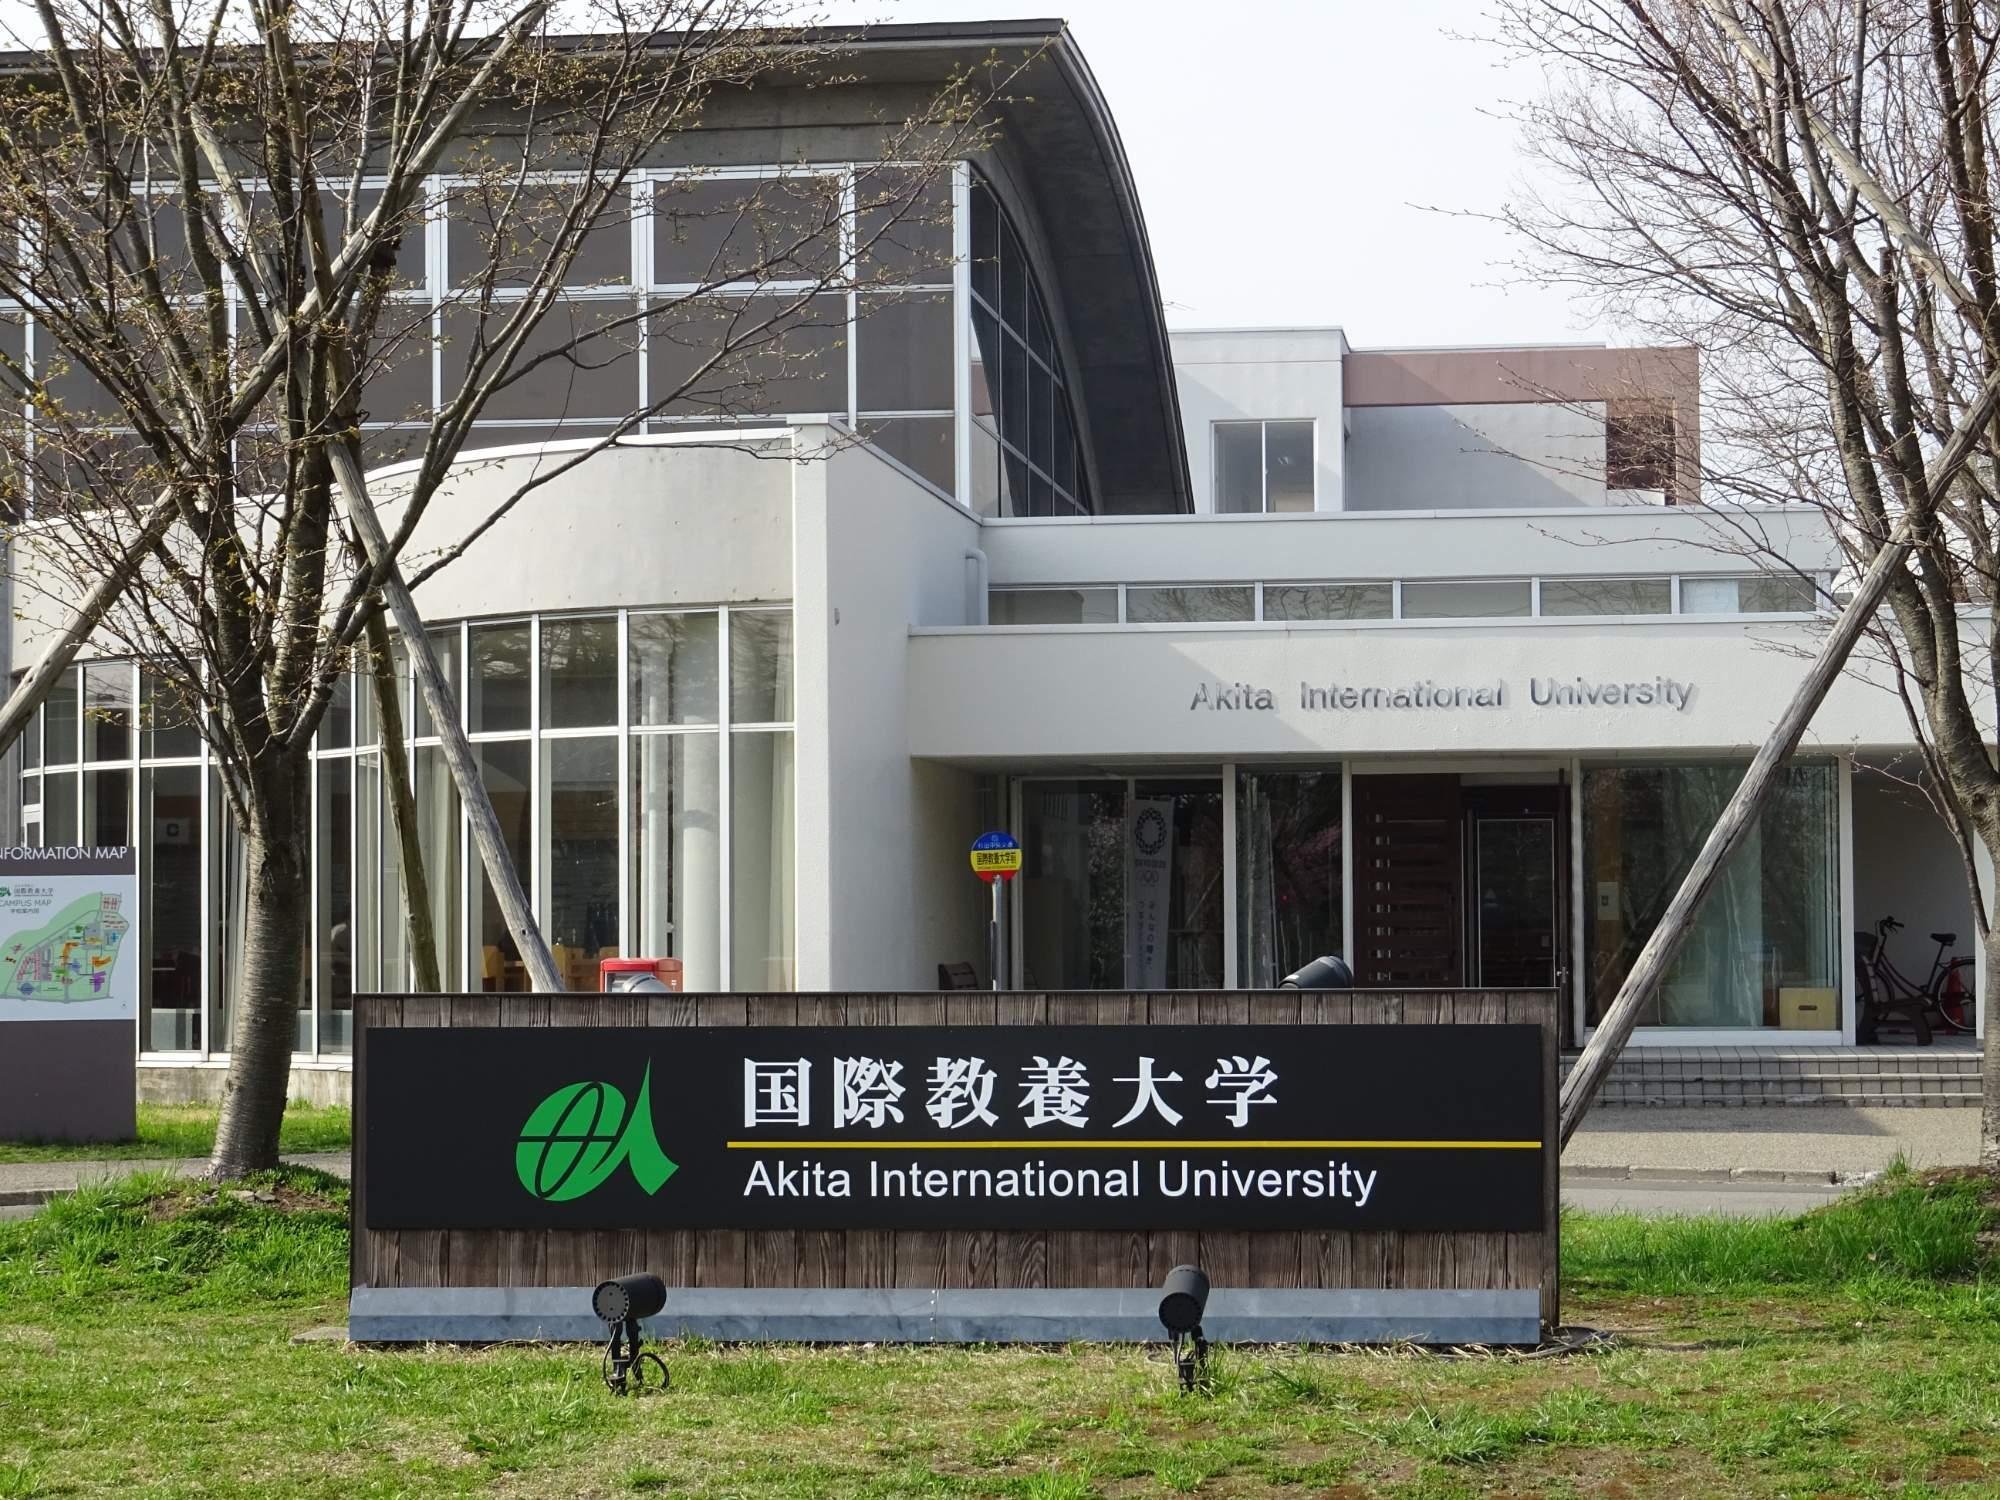 Akita International University se stala na jeden semestr studentovou alma mater. Foto: Archiv Daniela Gregera